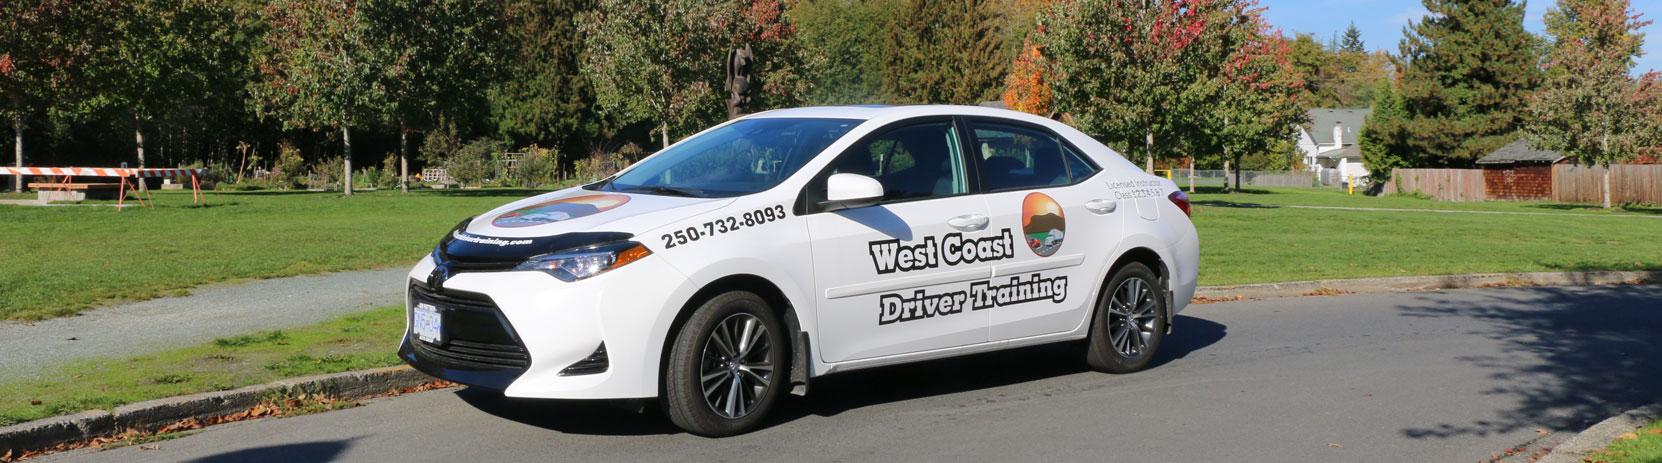 West Coast Driver Training & Education Inc logo